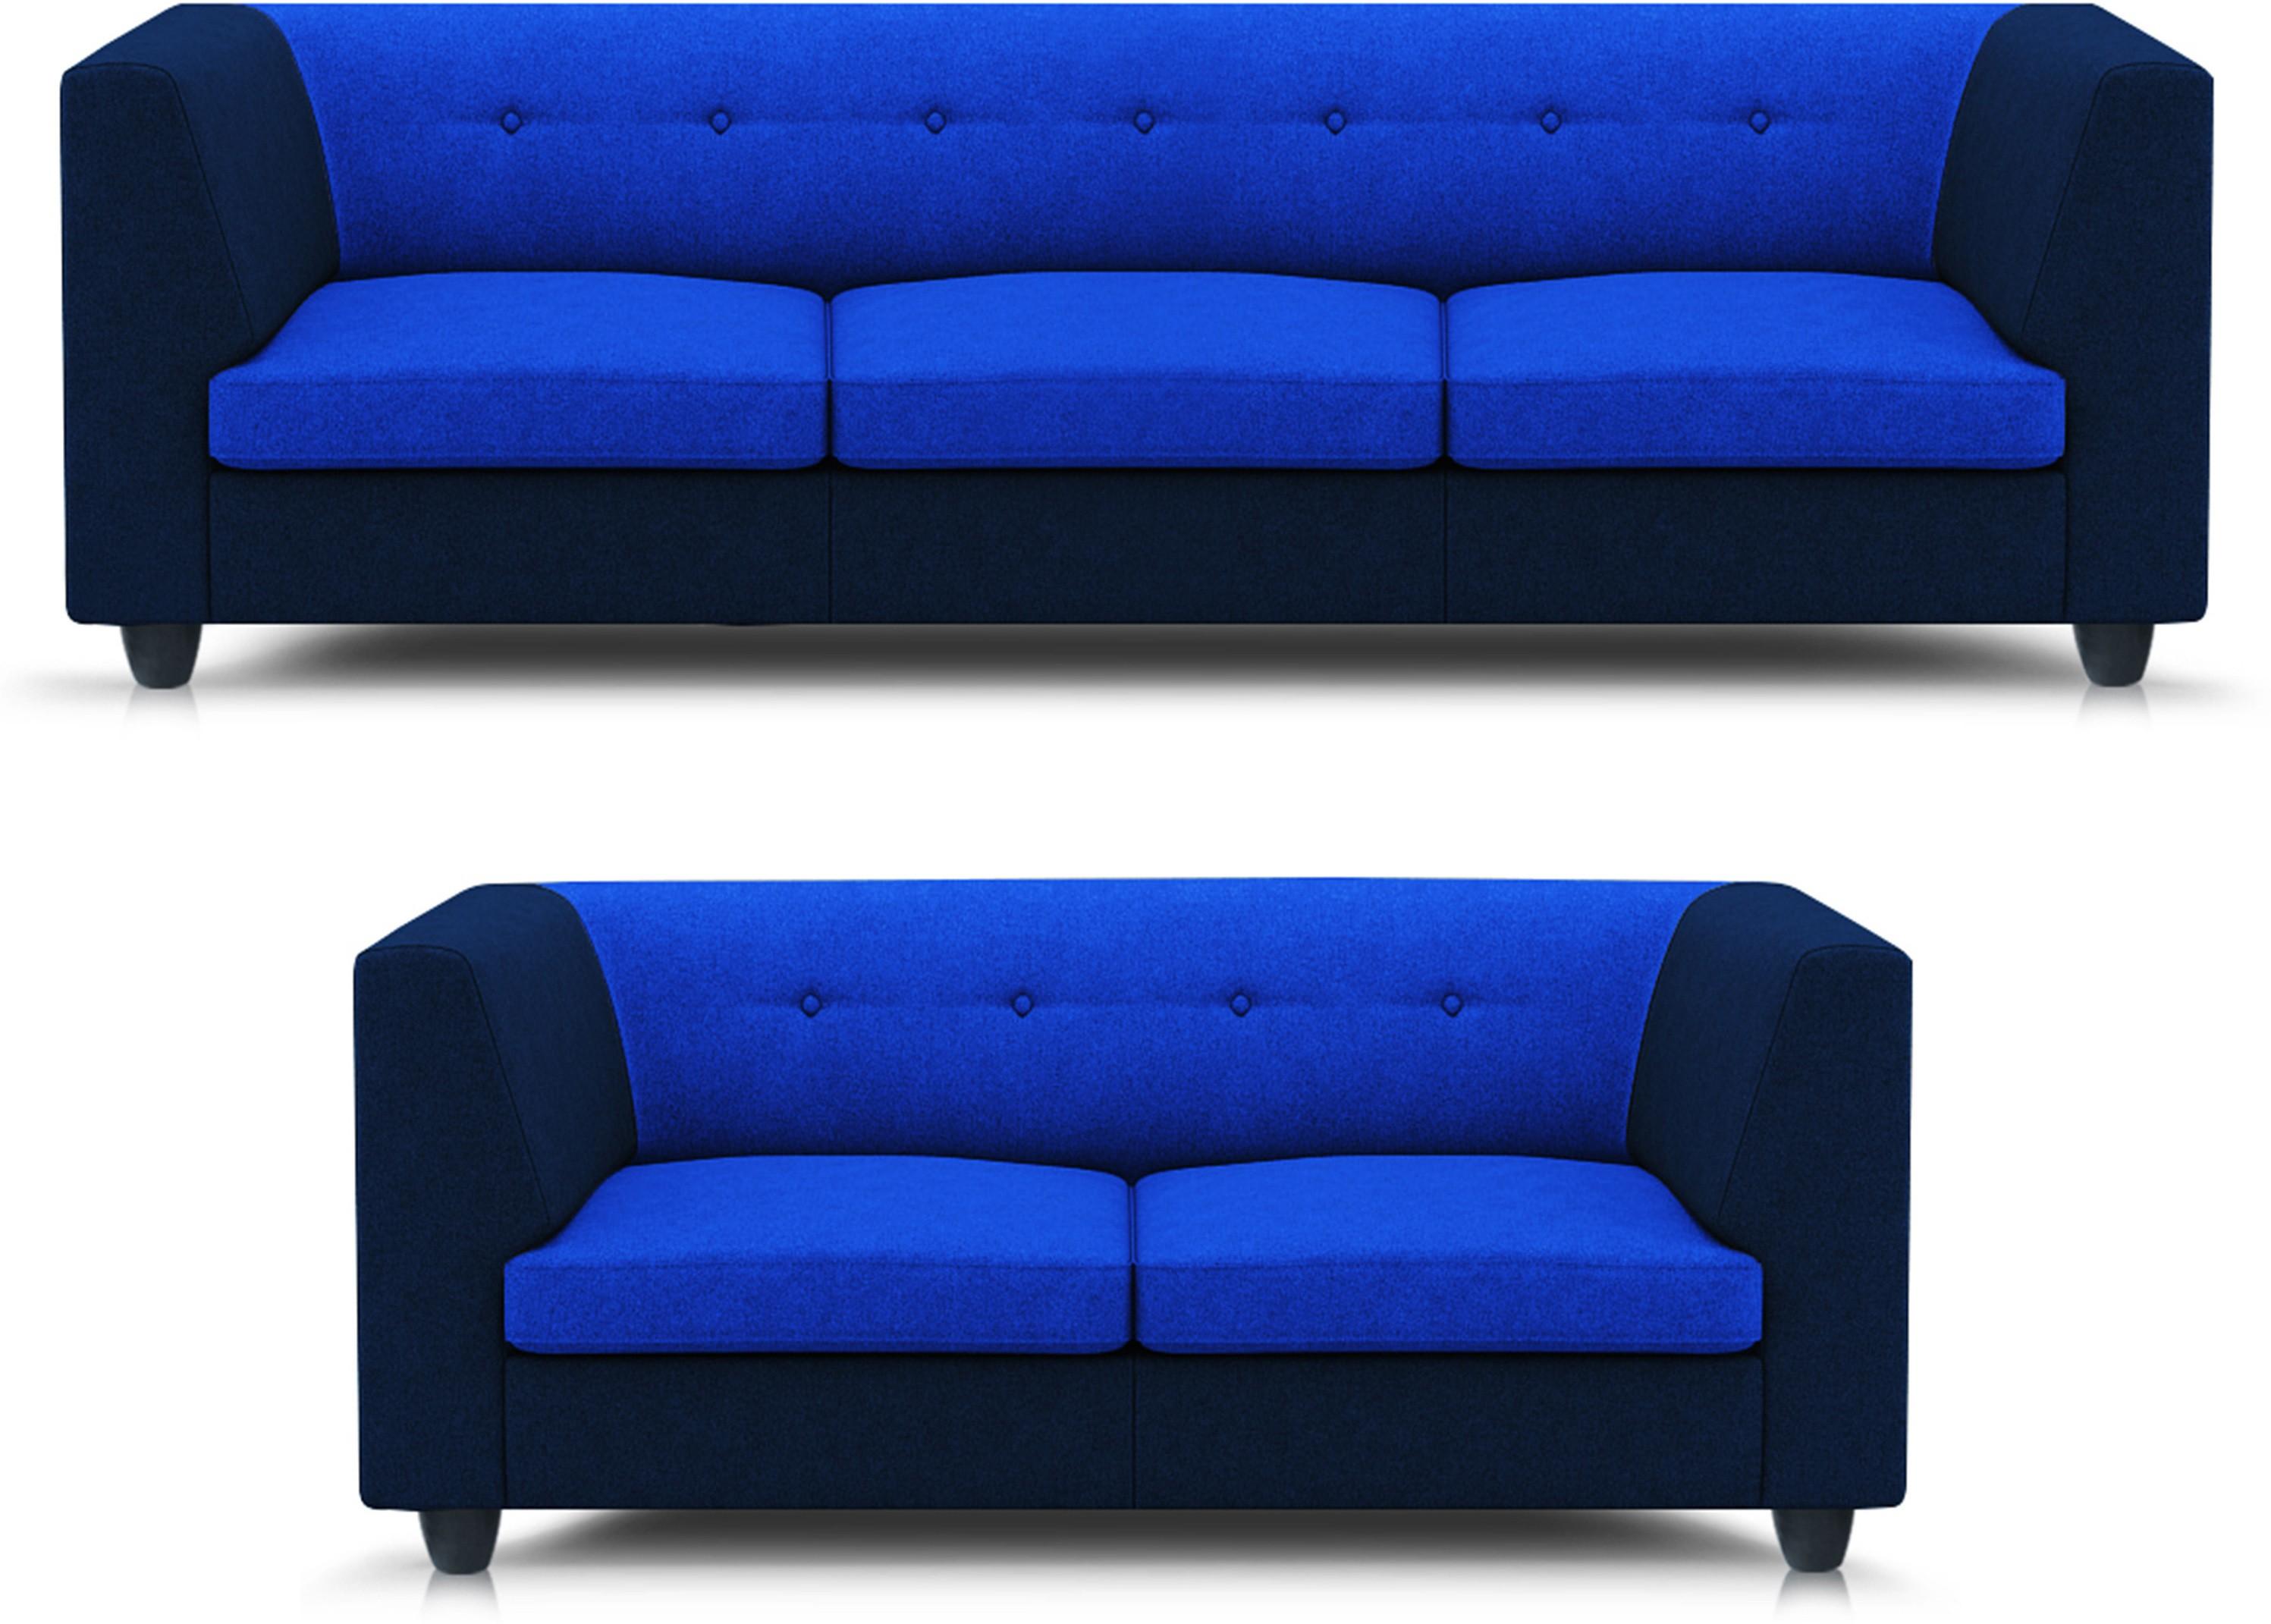 View Adorn homez Modern Solid Wood 3 + 2 Multi Sofa Set Furniture (Adorn homez)